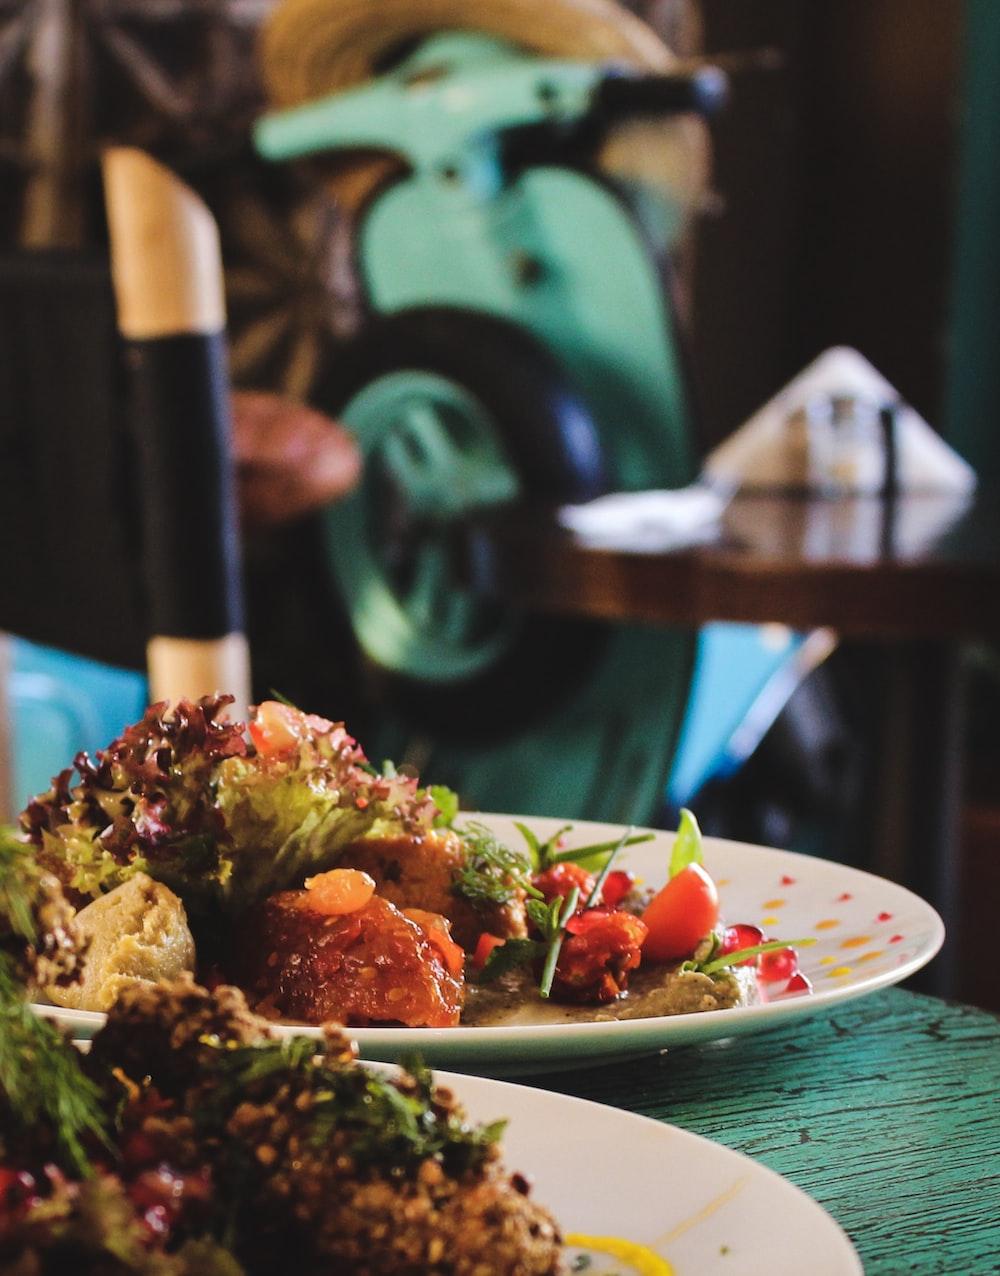 salad dish served on plate